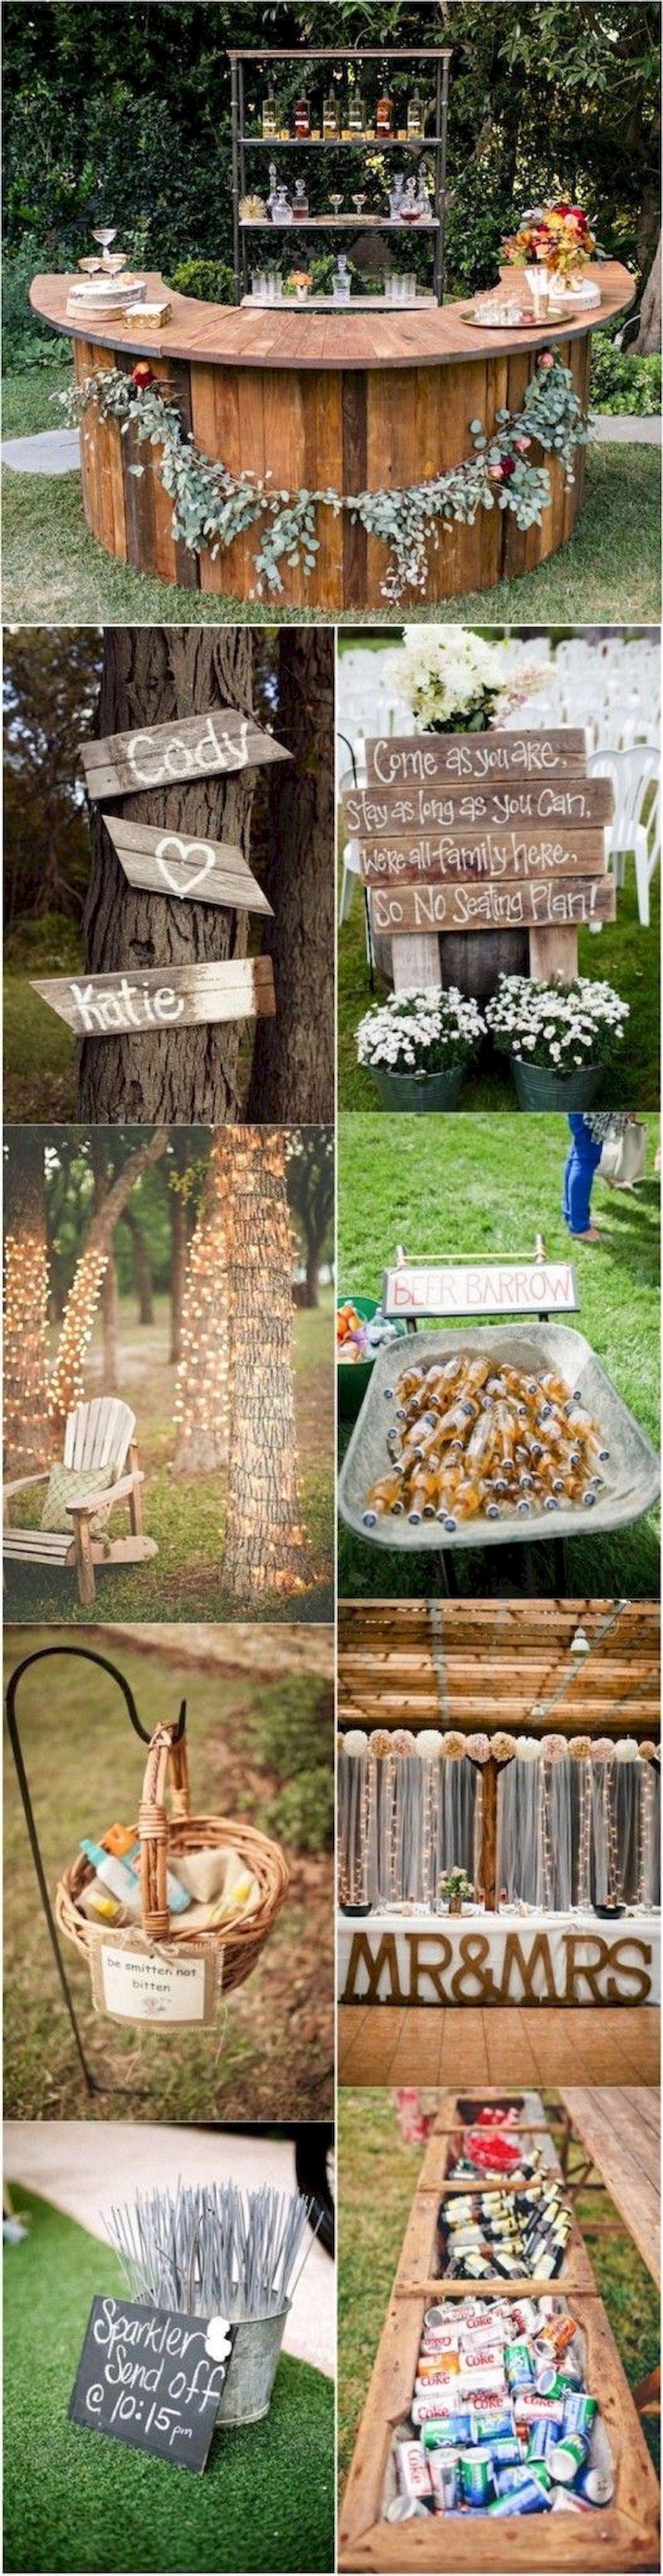 Elegant outdoor wedding decor ideas on a budget (19) # ...